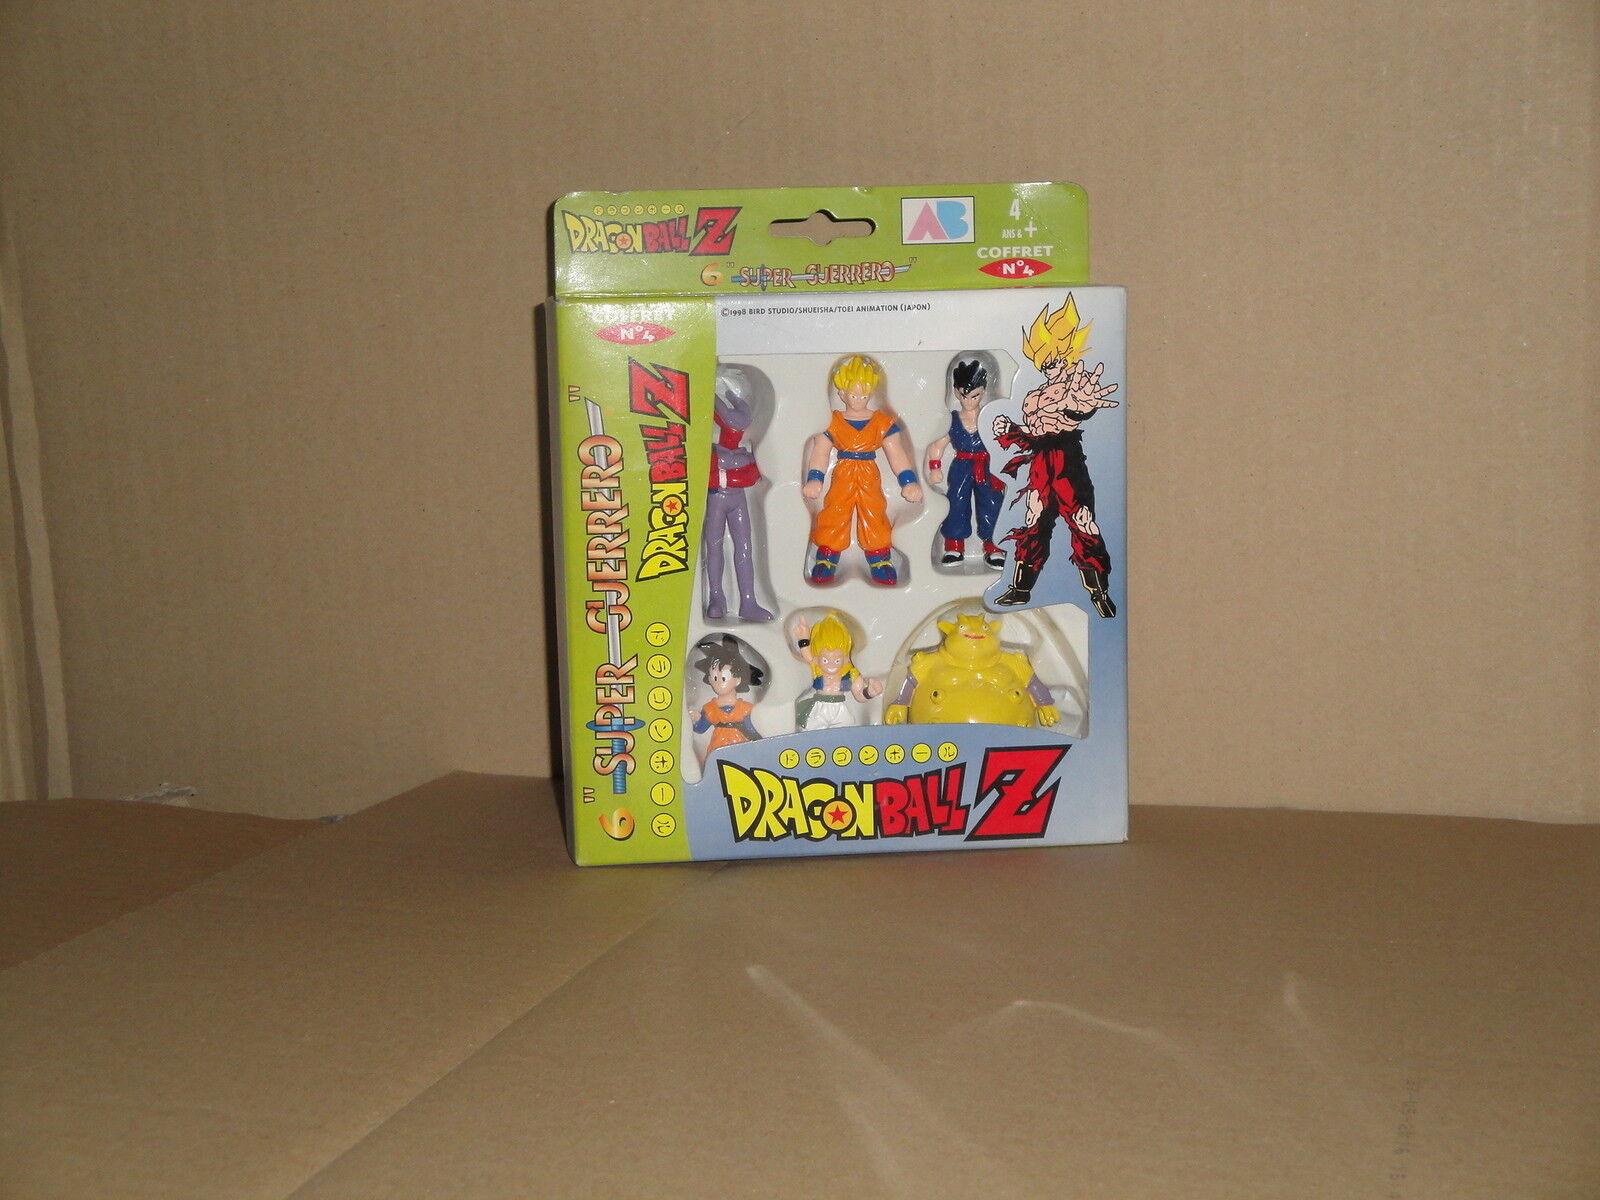 DRAGON BALL BALL DRAGON Z SUPER GUERERO BY AB TOYS COFFRET # 4 WHEN SIX FIGURES NEW IN BOX 662b4f